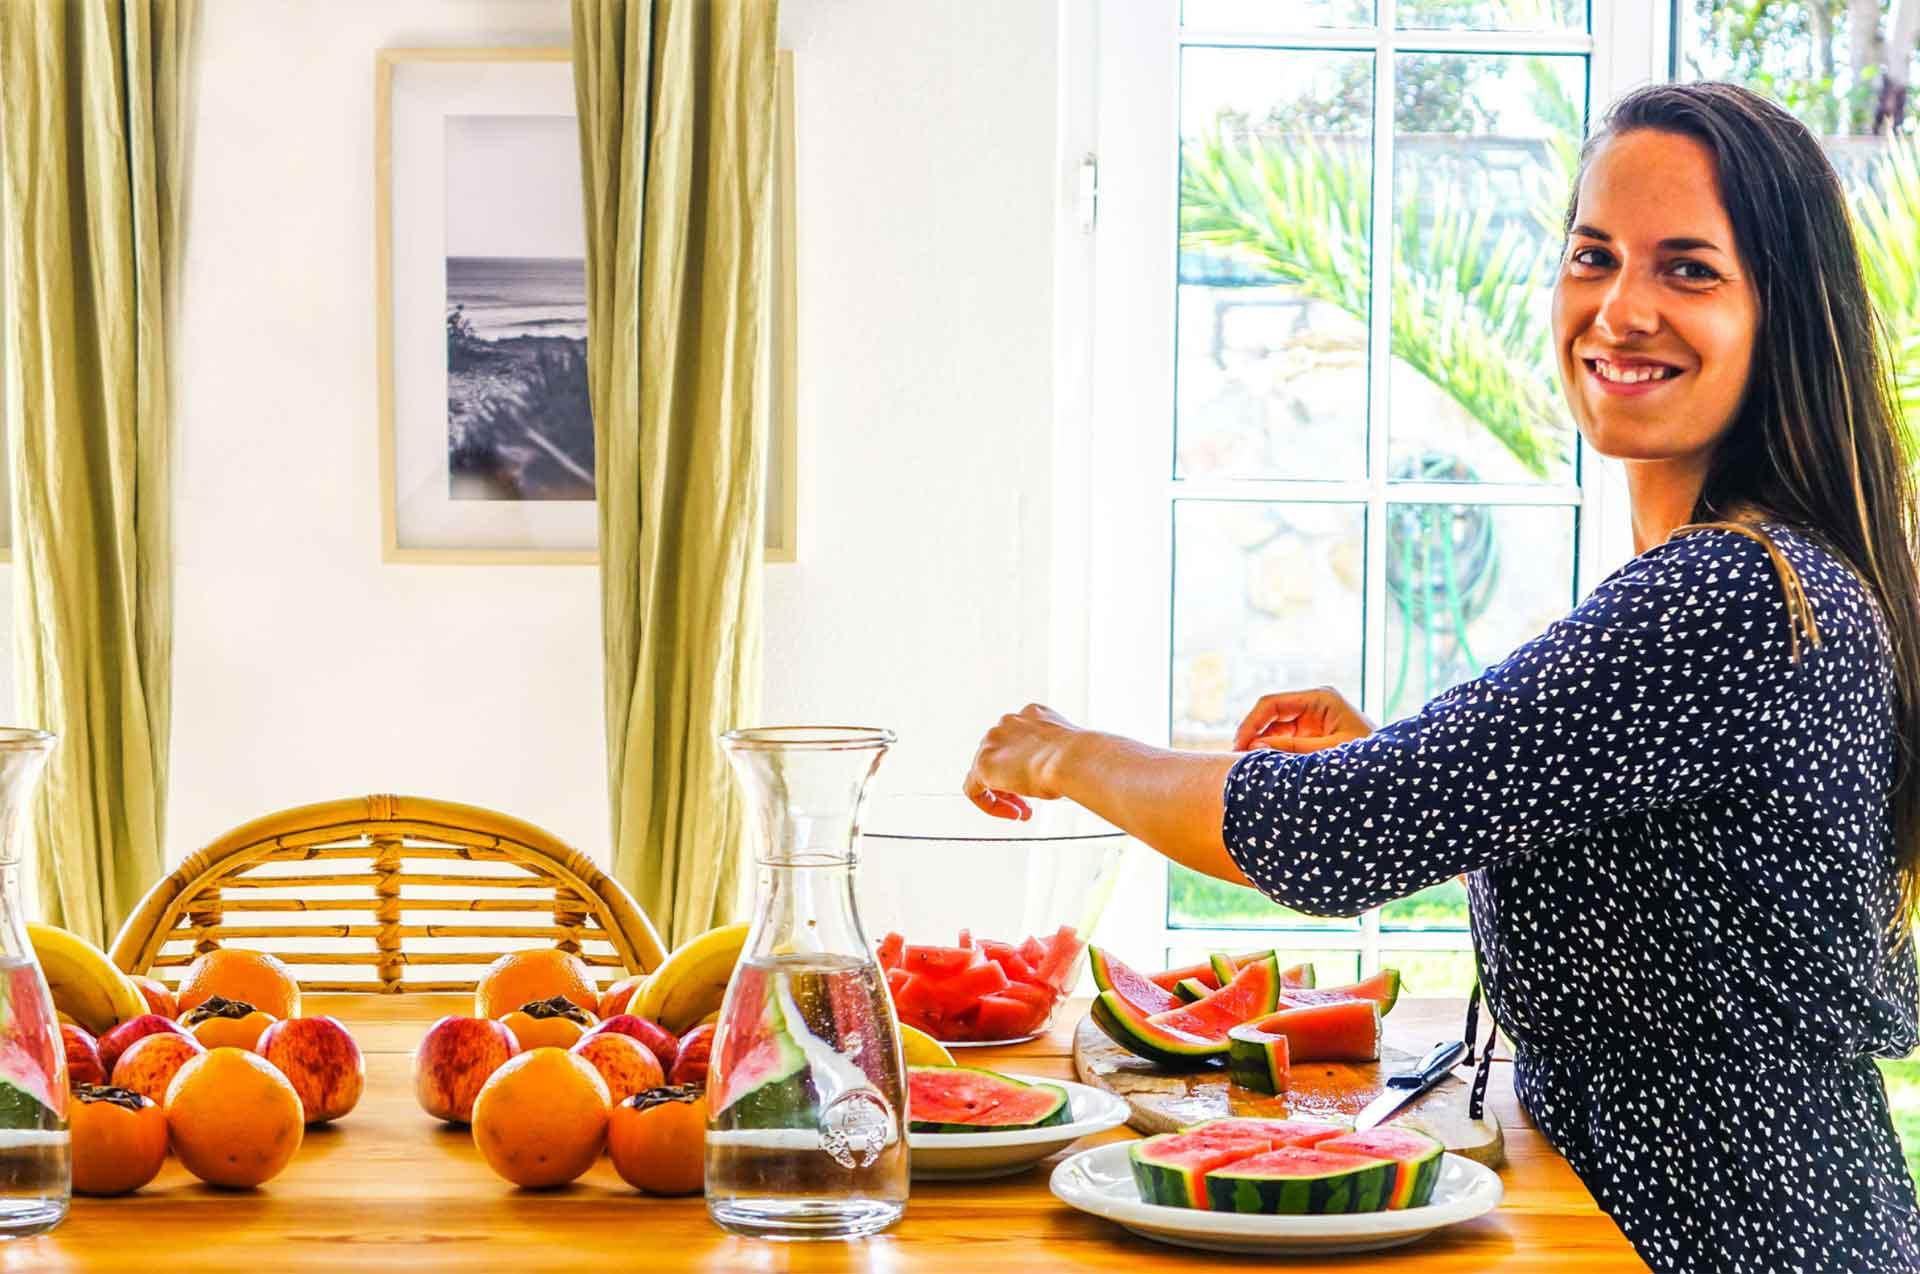 Vegan ernähren – mit Happy Vegan – dein vegan ernähren Online-Kurs